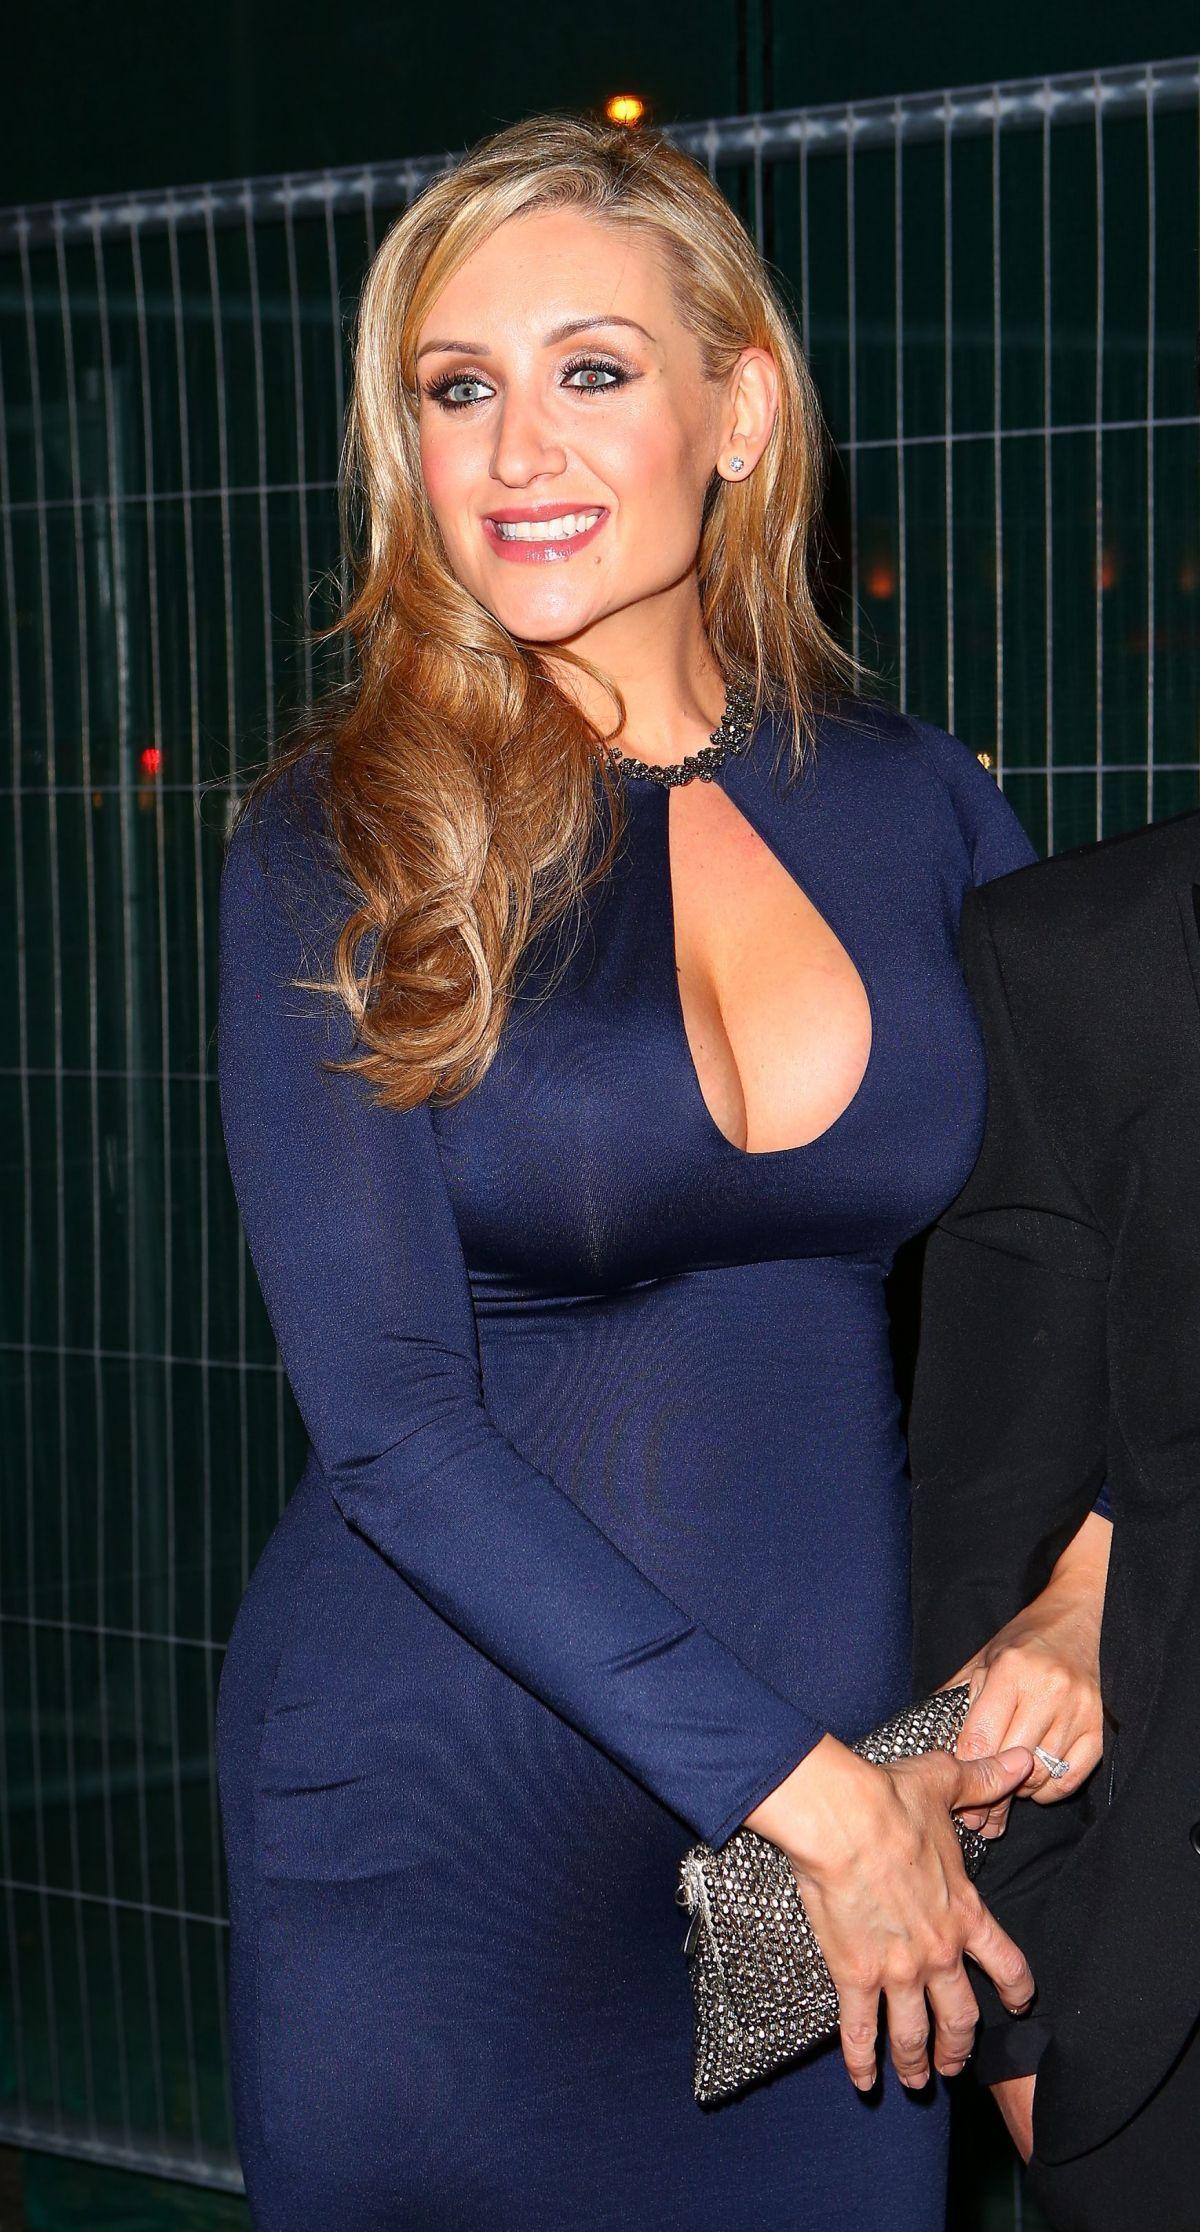 Jamie Silberhartz,Vivien Cardone Sex nude Fay Ripley (born 1966),Janet Jackson born May 16, 1966 (age 52)